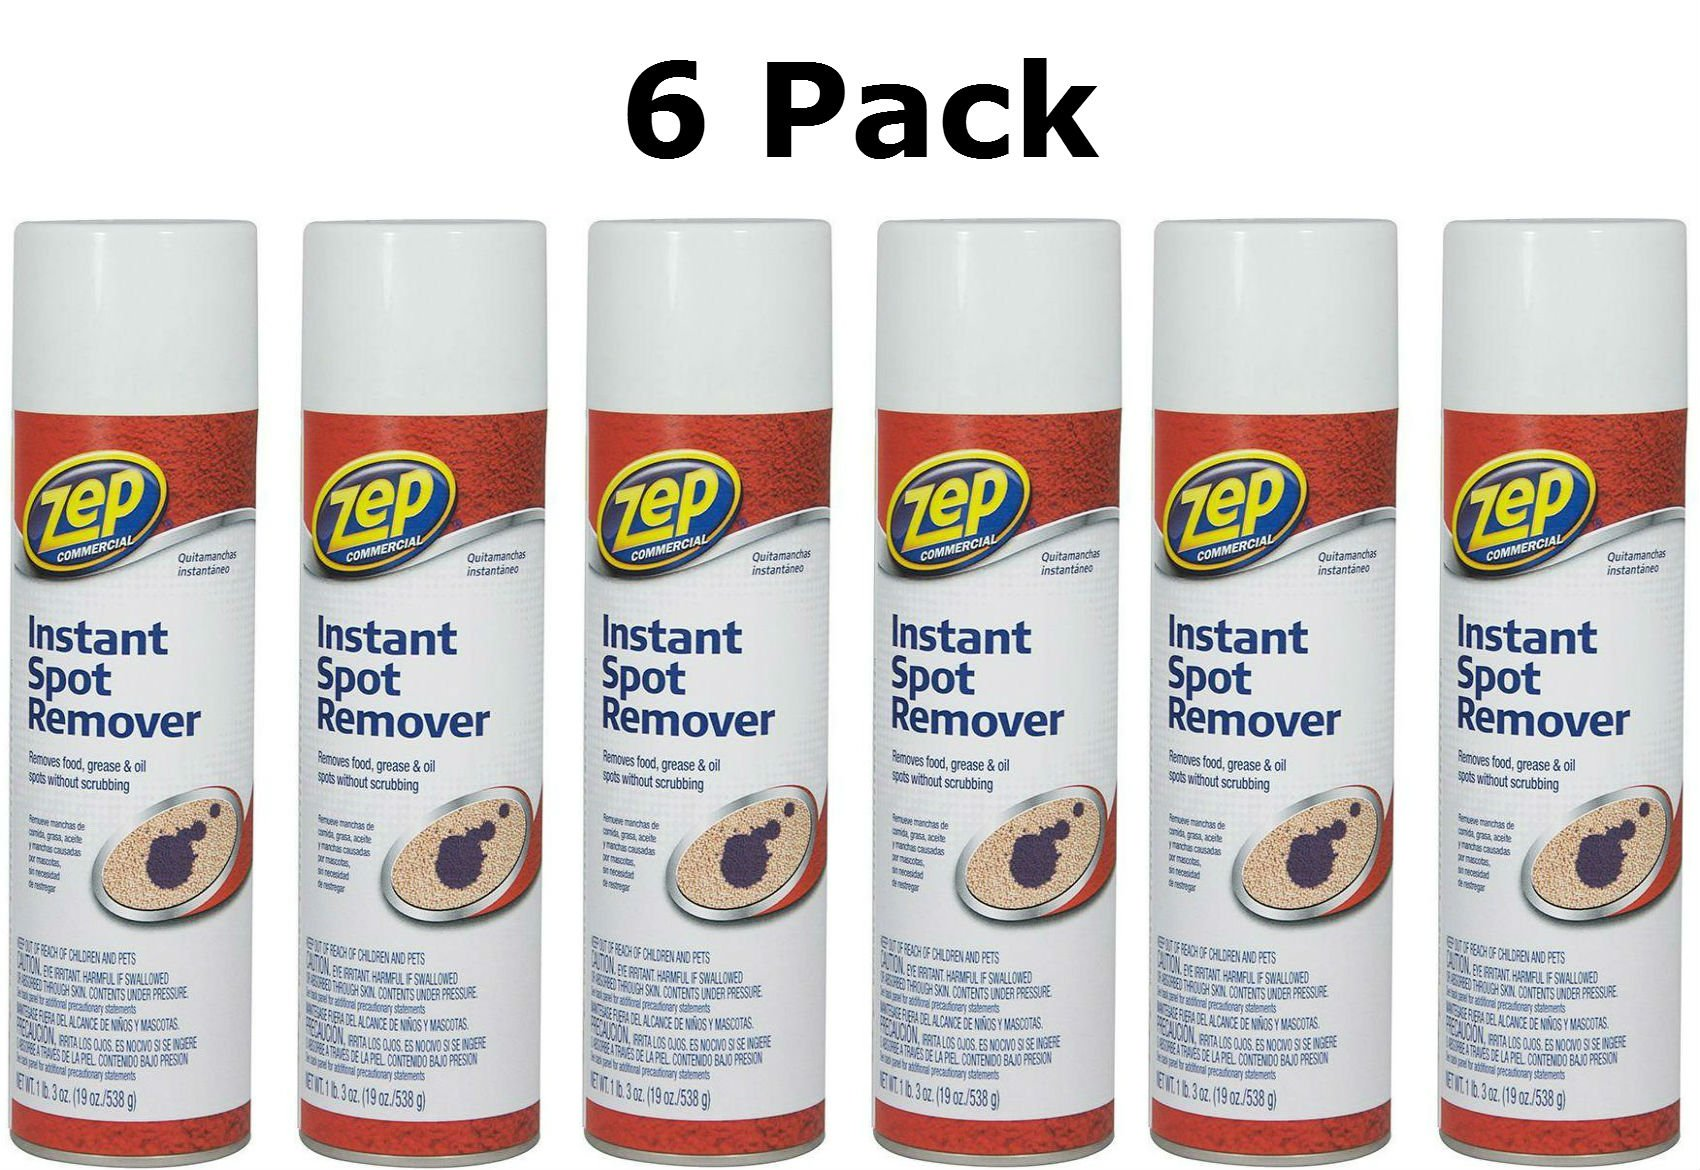 Zep Carpet Cleaner Commercial Instant Spot Remover, 19 Oz (6 Pack)